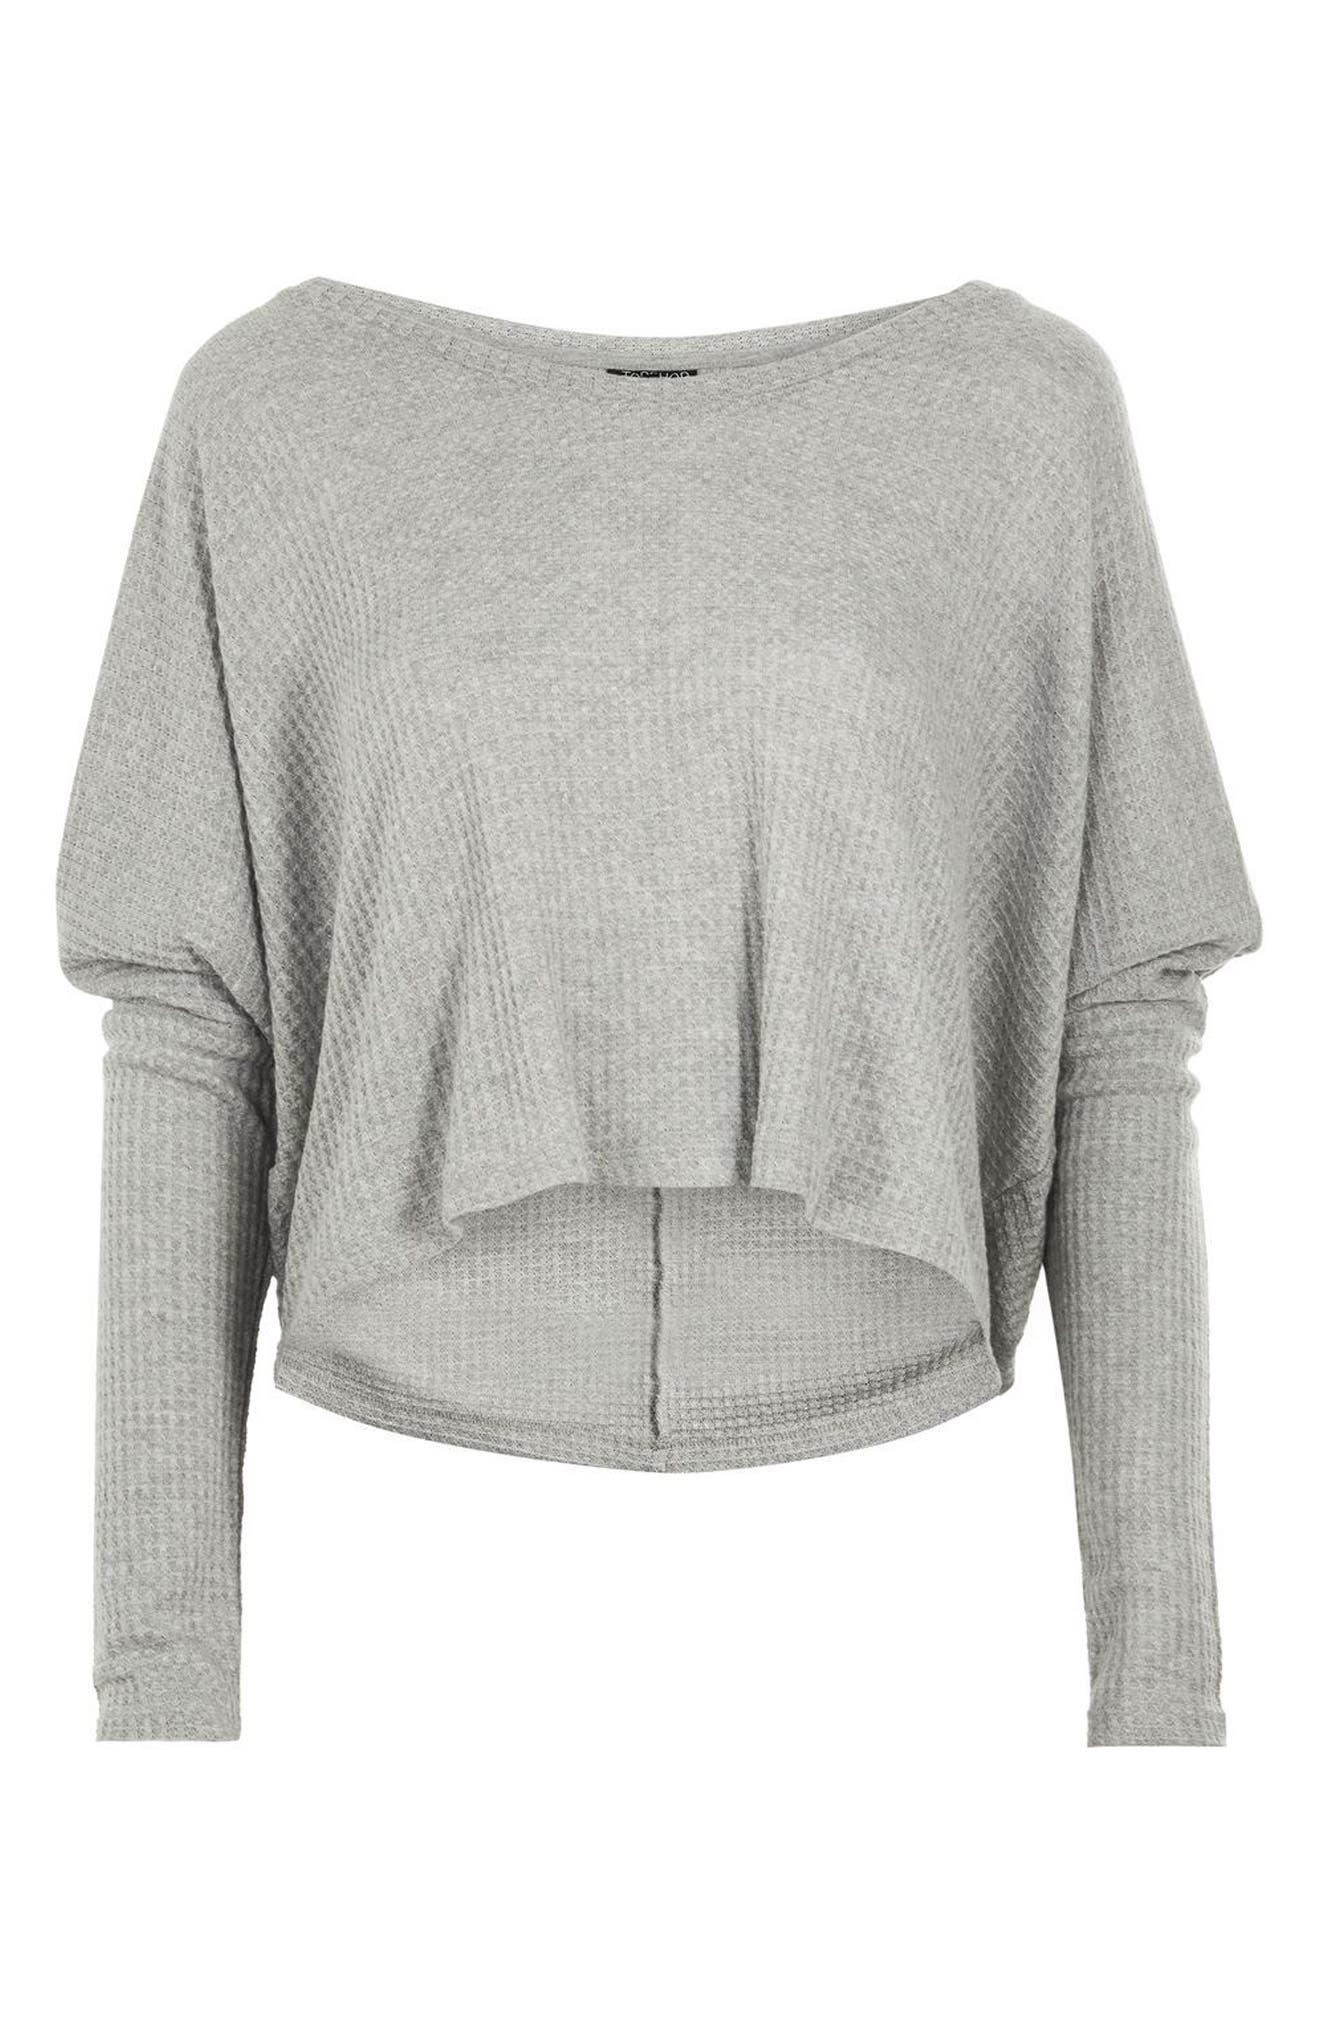 Waffle Knit Sweatshirt,                             Alternate thumbnail 3, color,                             020